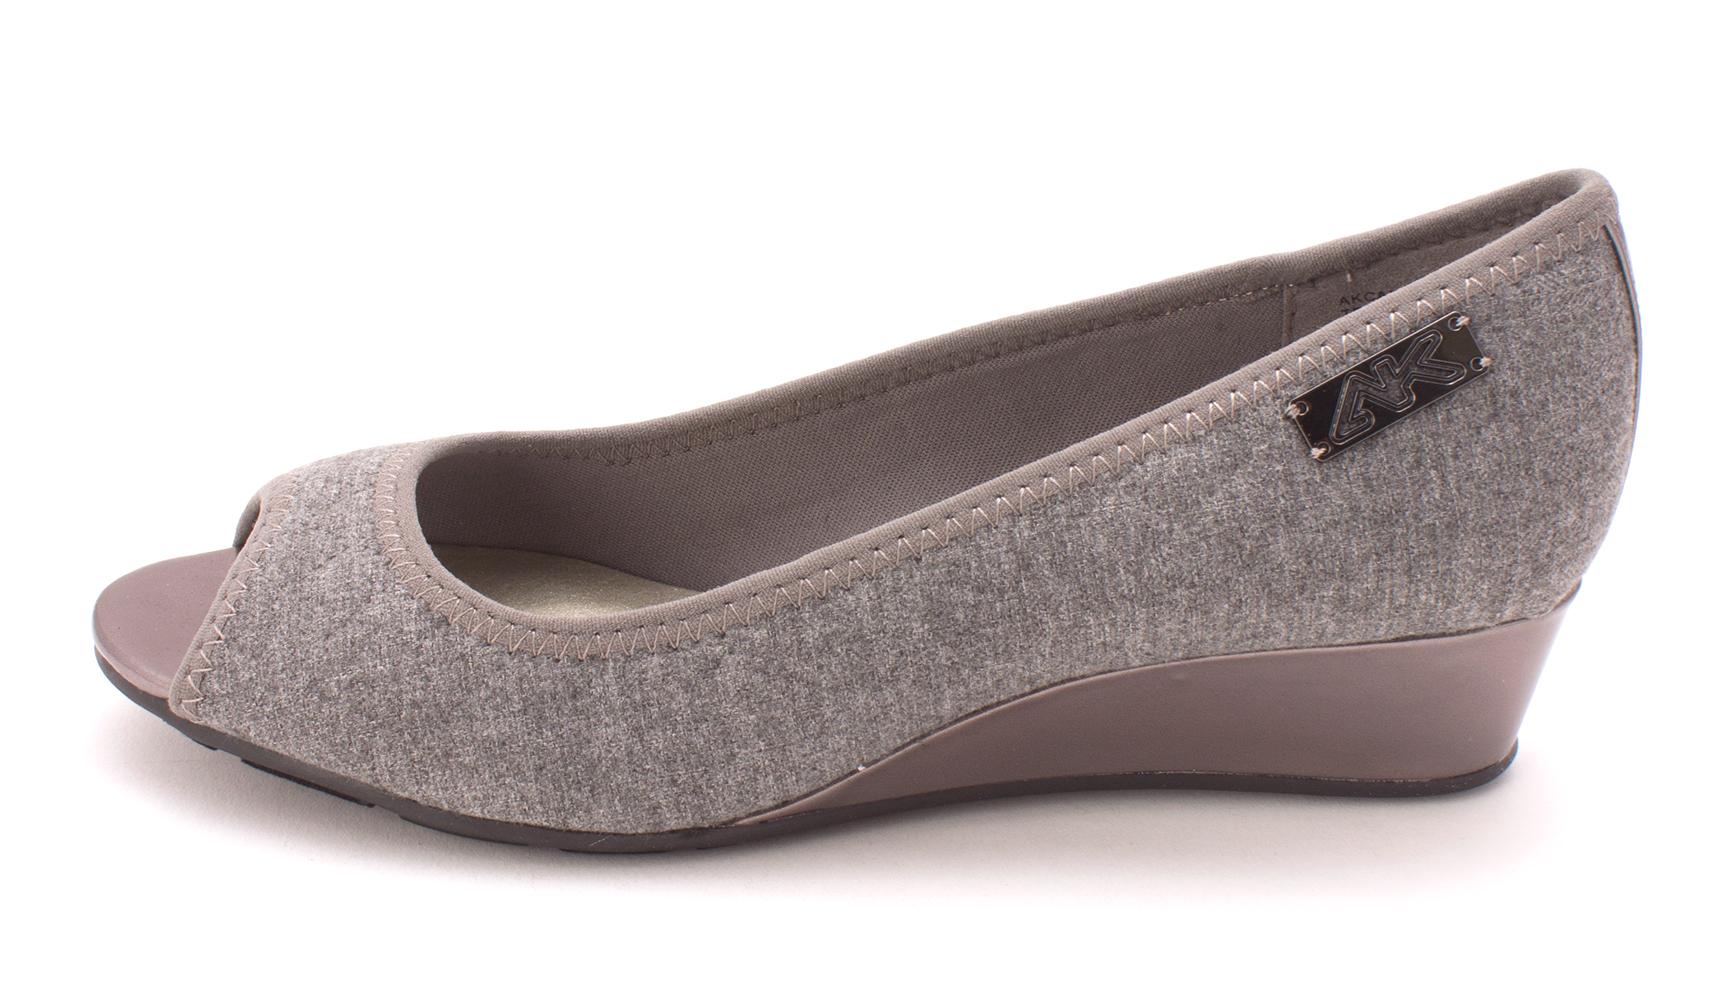 Anne Klein Womens Camrynne Peep Toe Wedge Pumps Grey Size 6.0